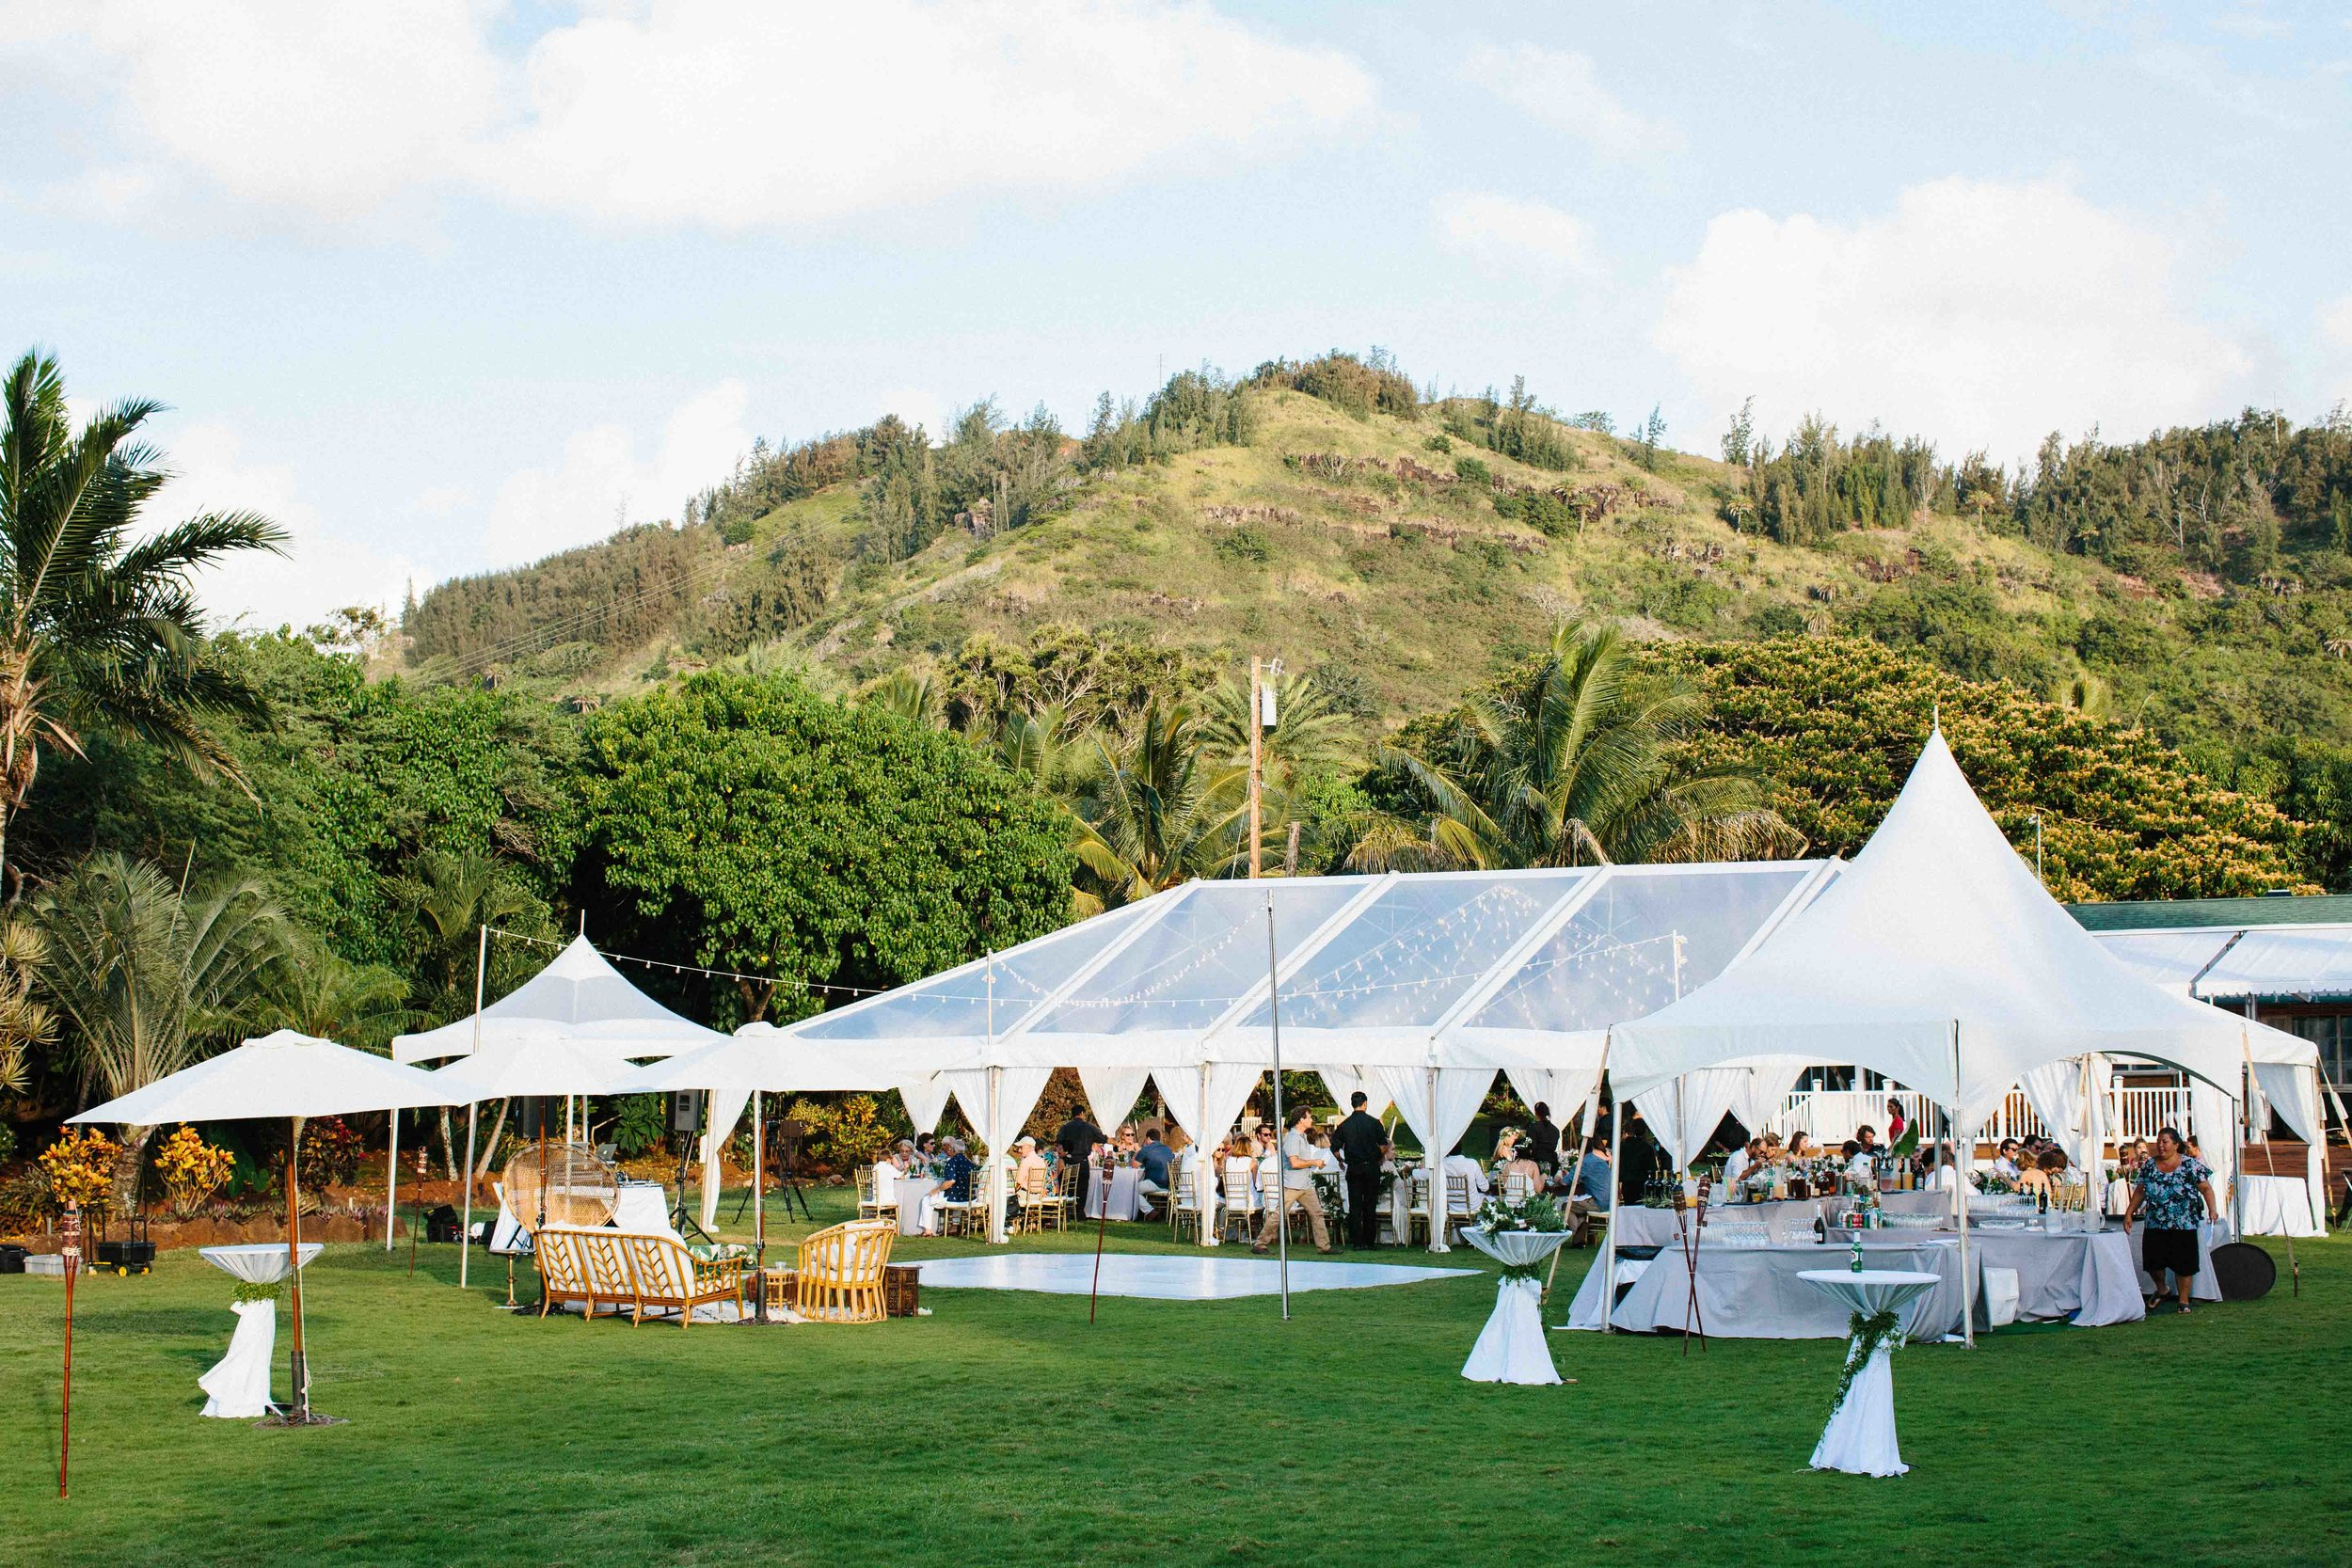 Wedding Event at Loulu Palm Farm Estate